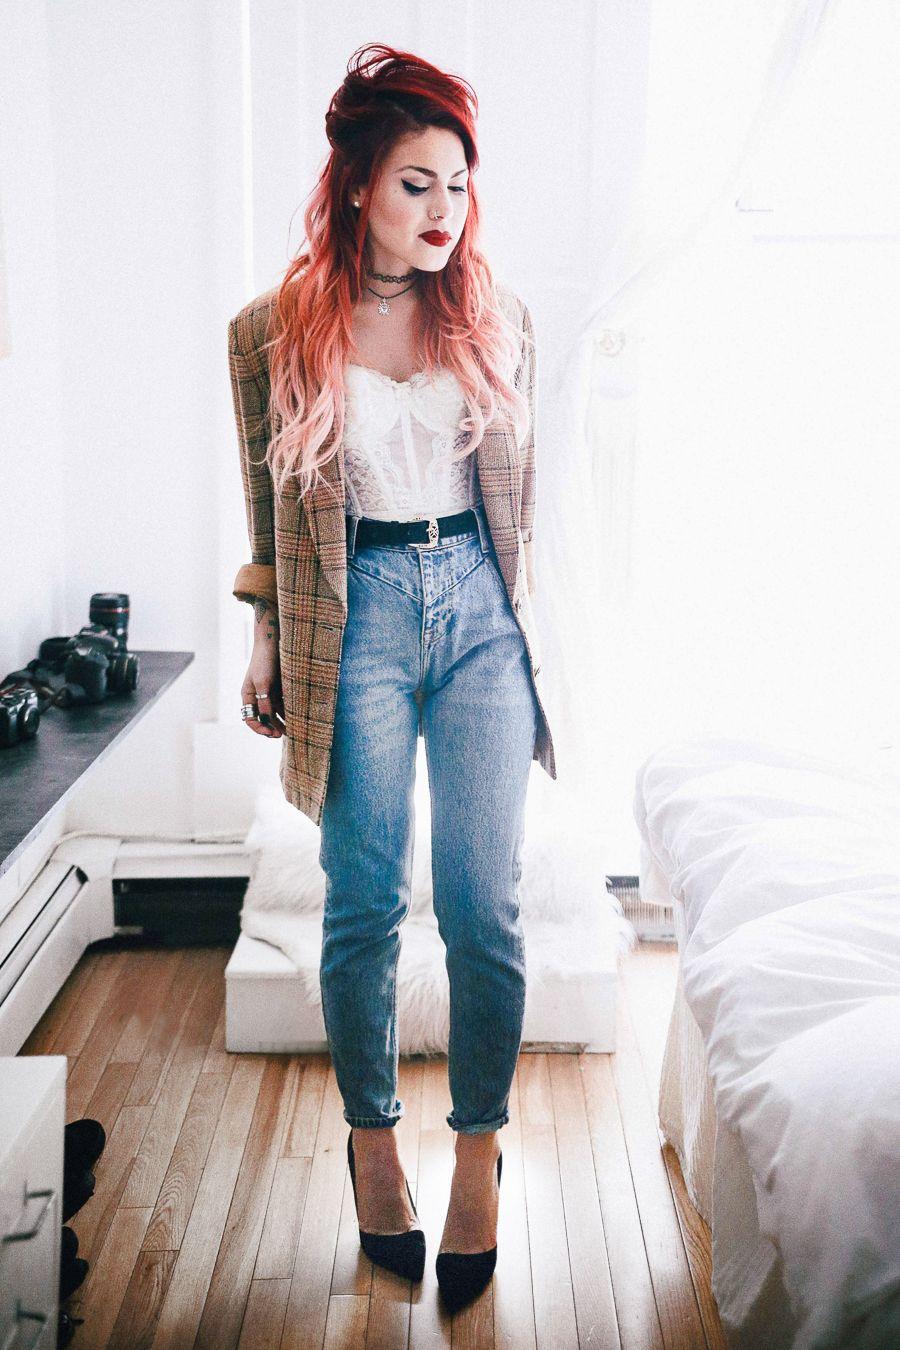 a0a0c5a233f With dark high waisted jeans